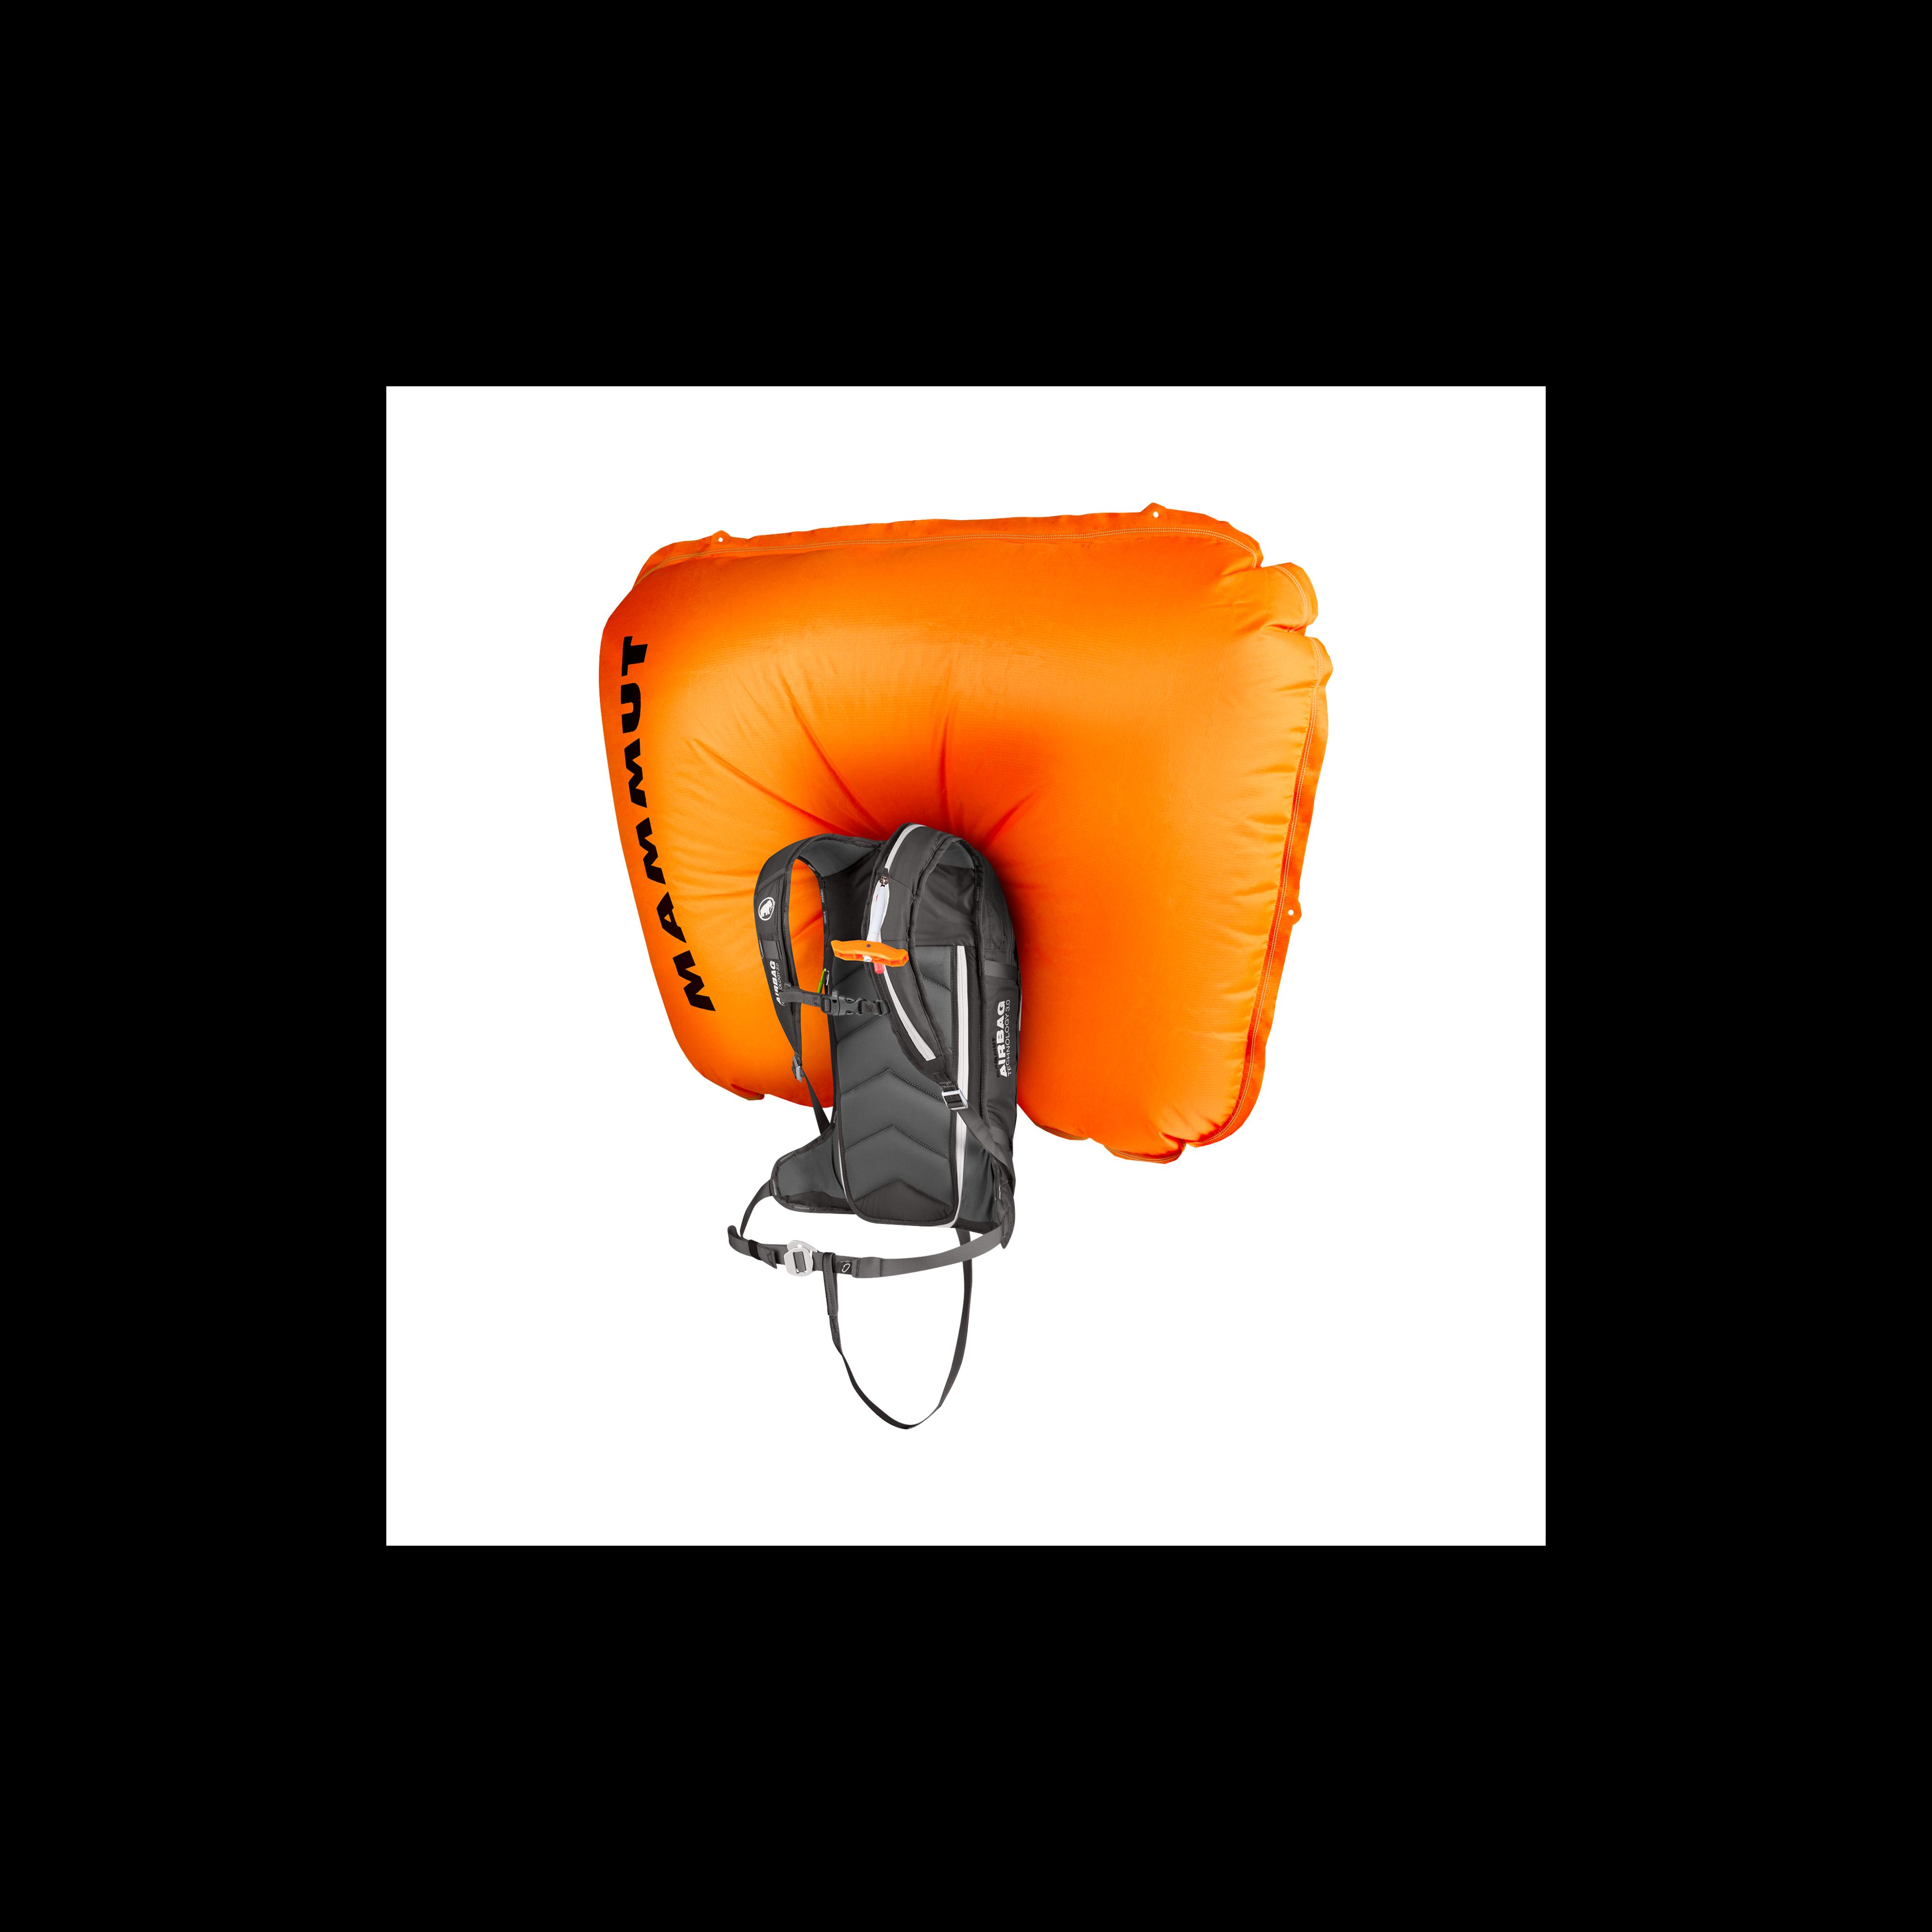 Flip Removable Airbag 3.0 - 22 L, graphite thumbnail